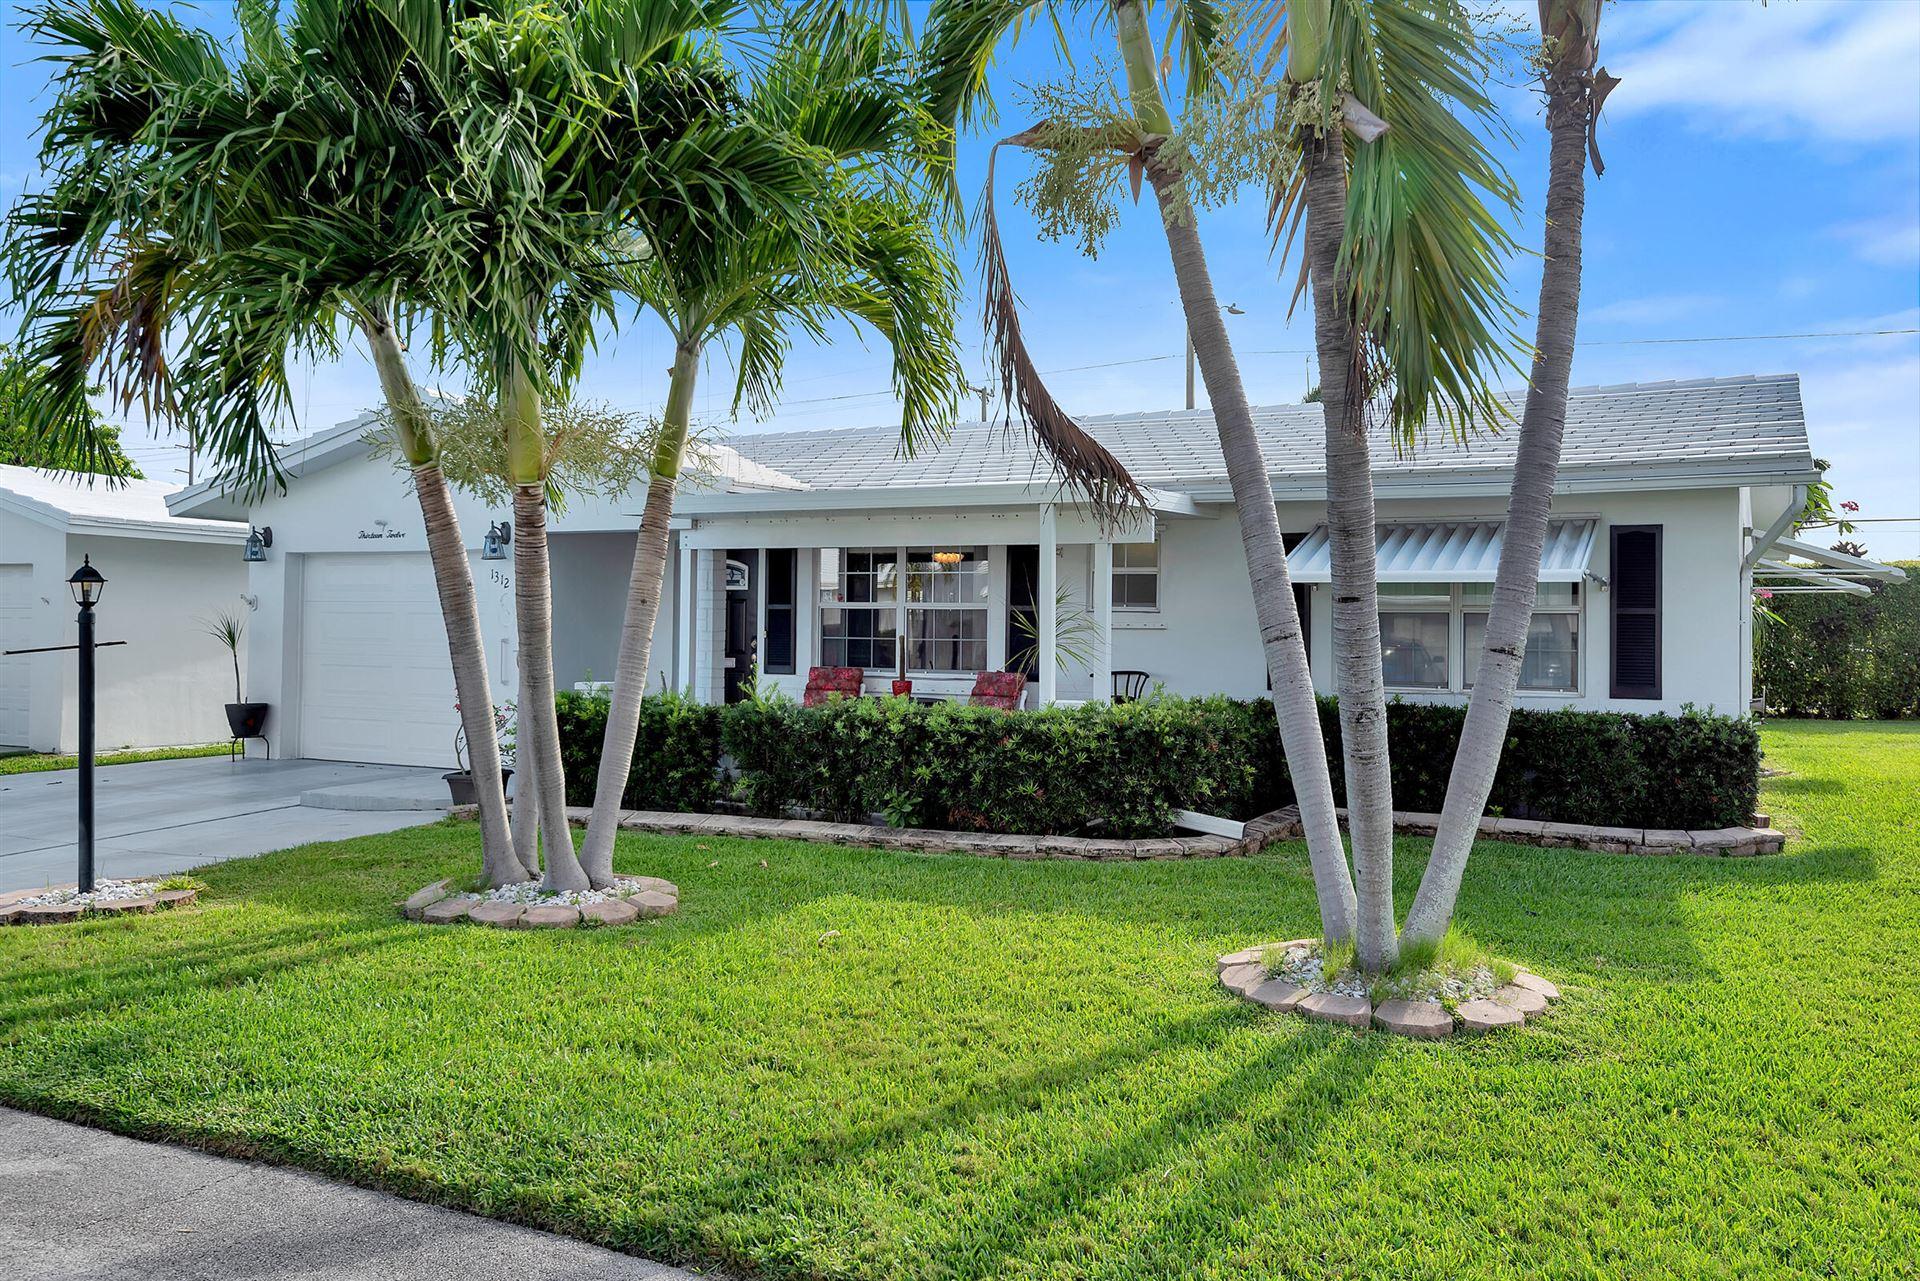 Photo of 1312 SW 24th Street, Boynton Beach, FL 33426 (MLS # RX-10715437)